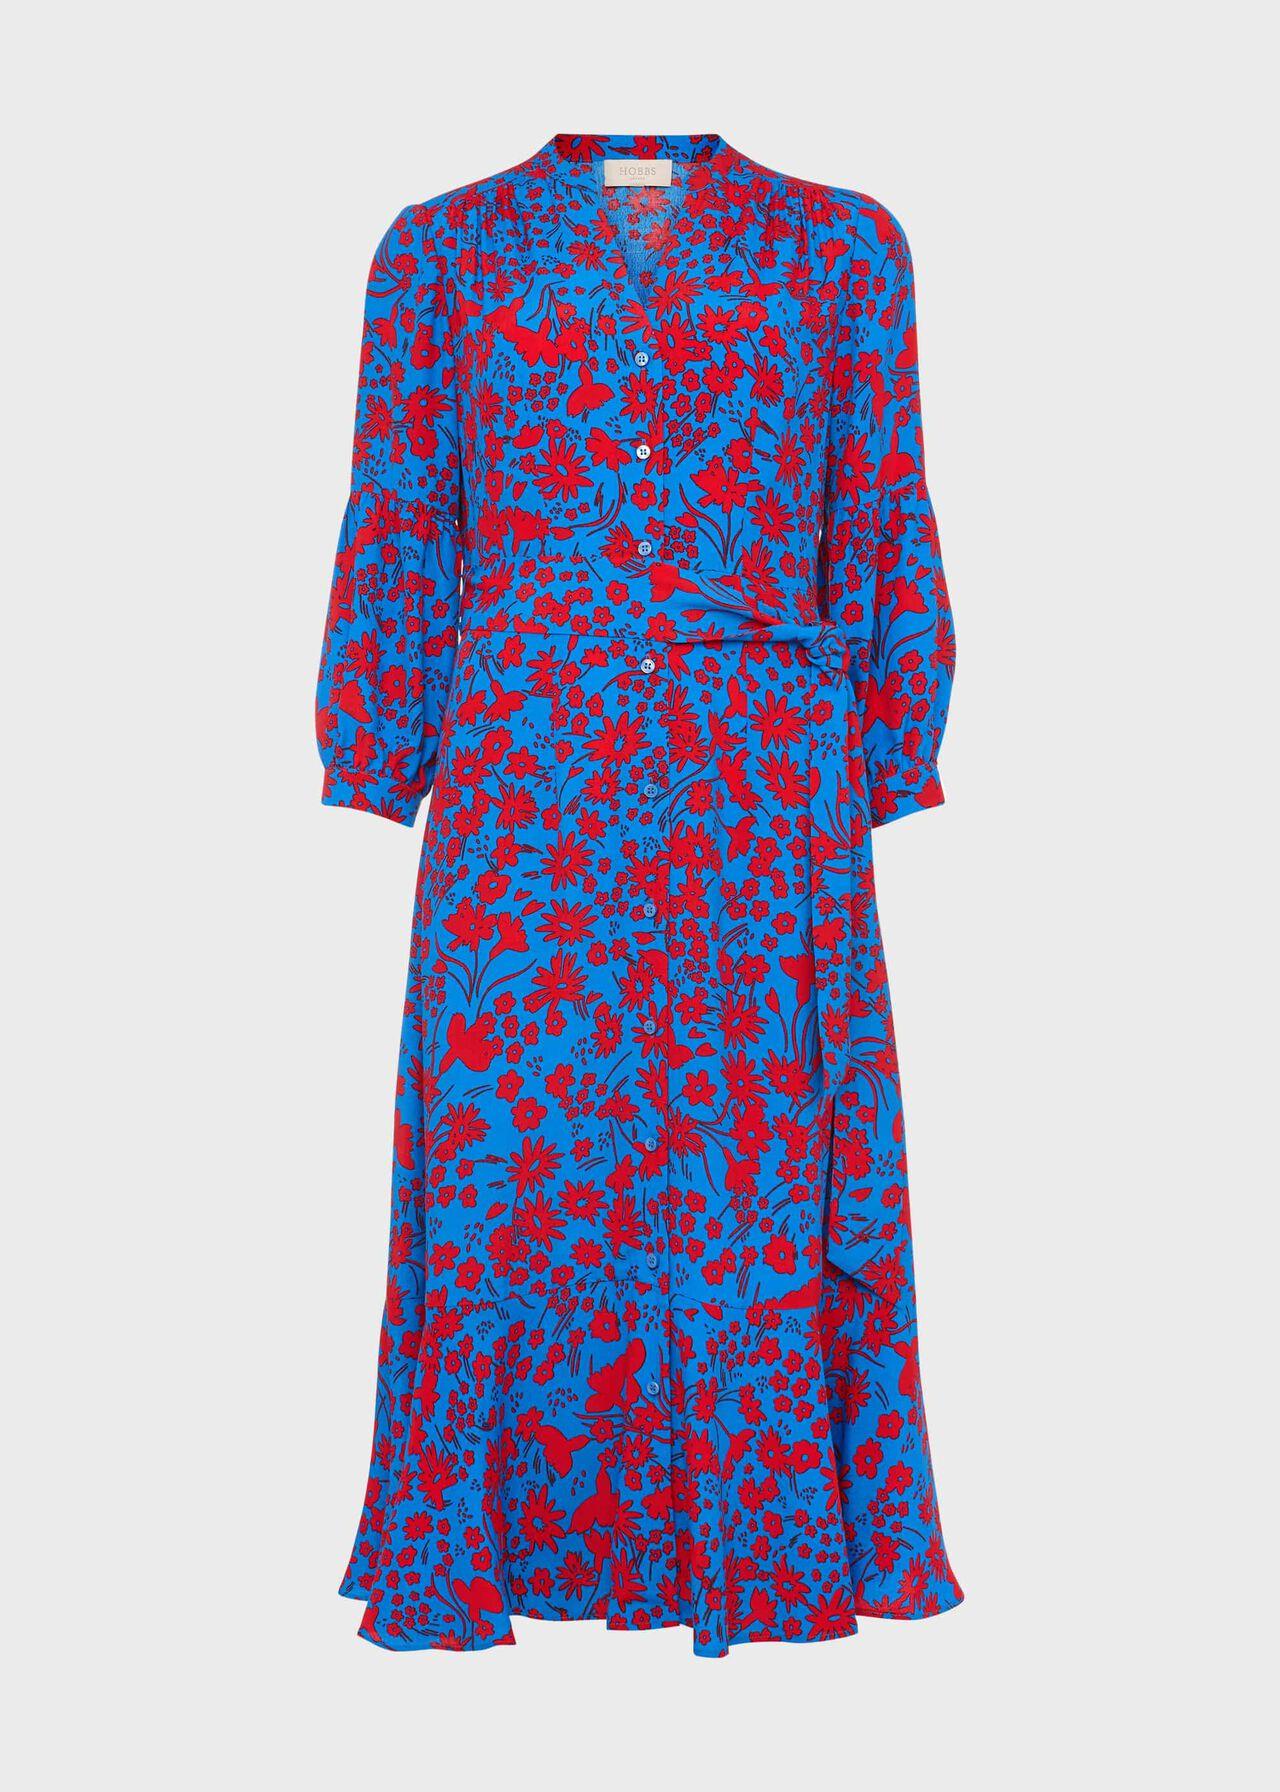 Petite Carla Floral Midi Dress Red Azure Blue